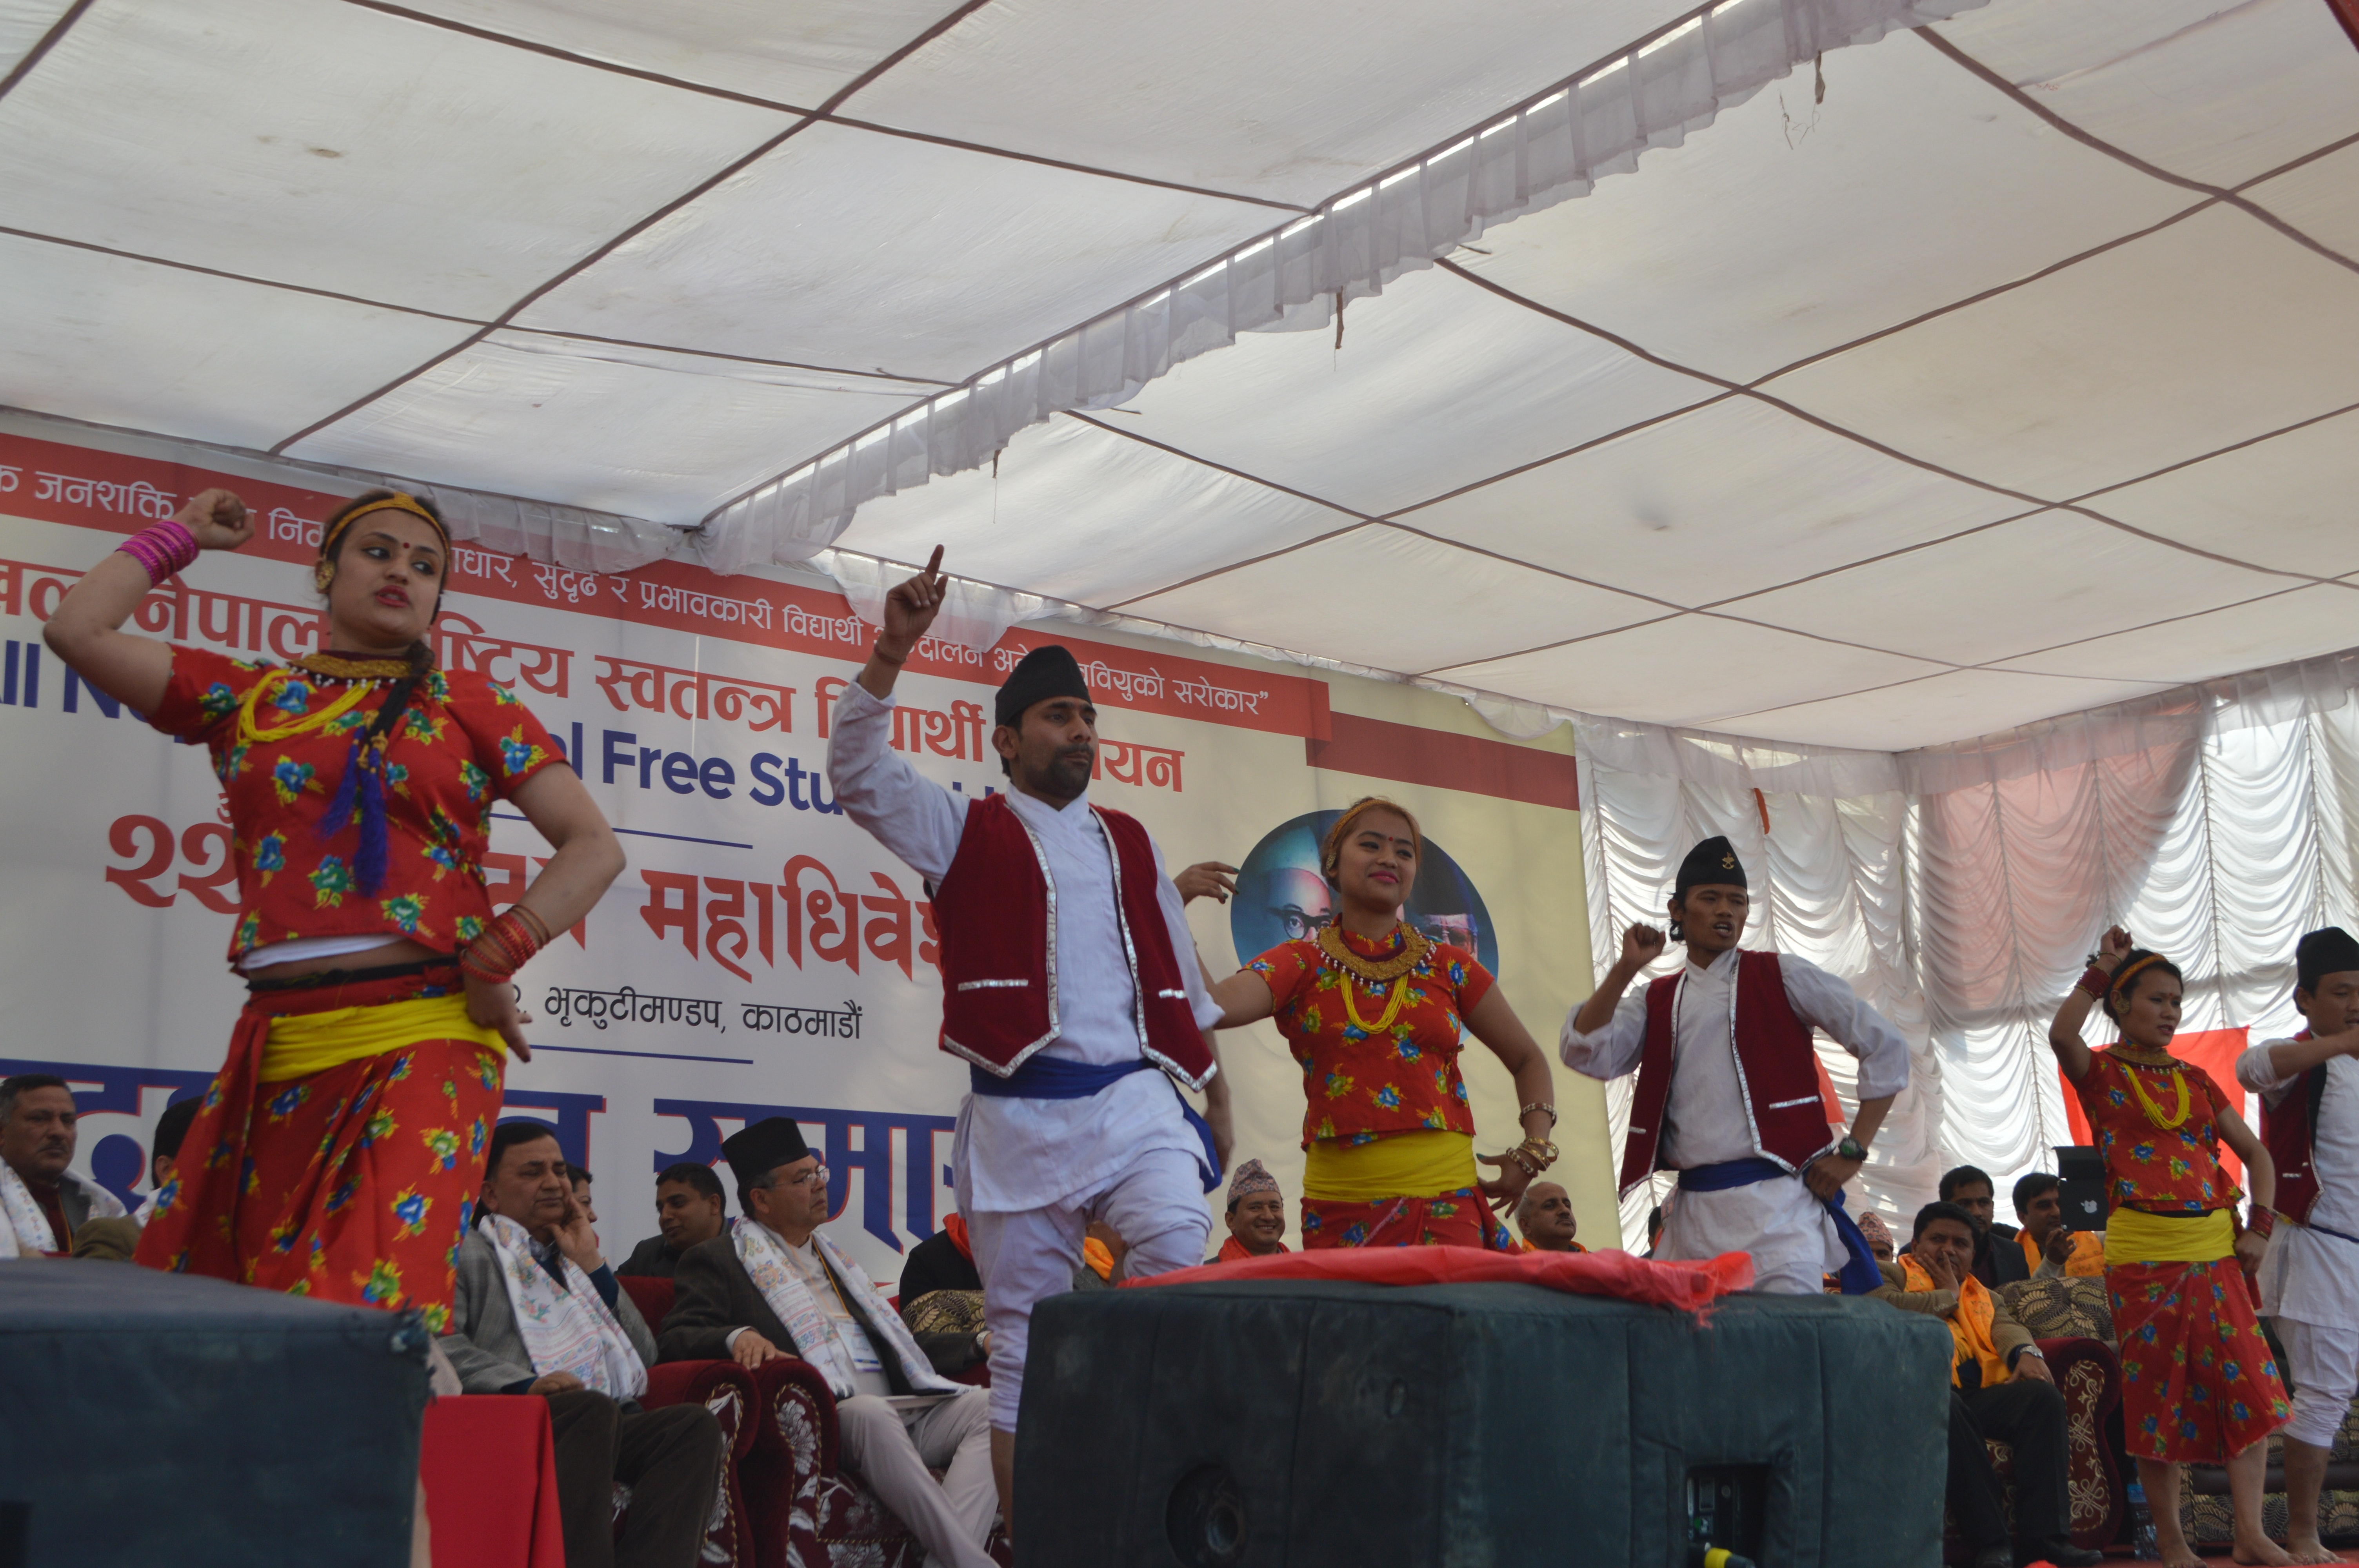 Free stock photo of Annfsu Nepal, Cultural dance, festival dance